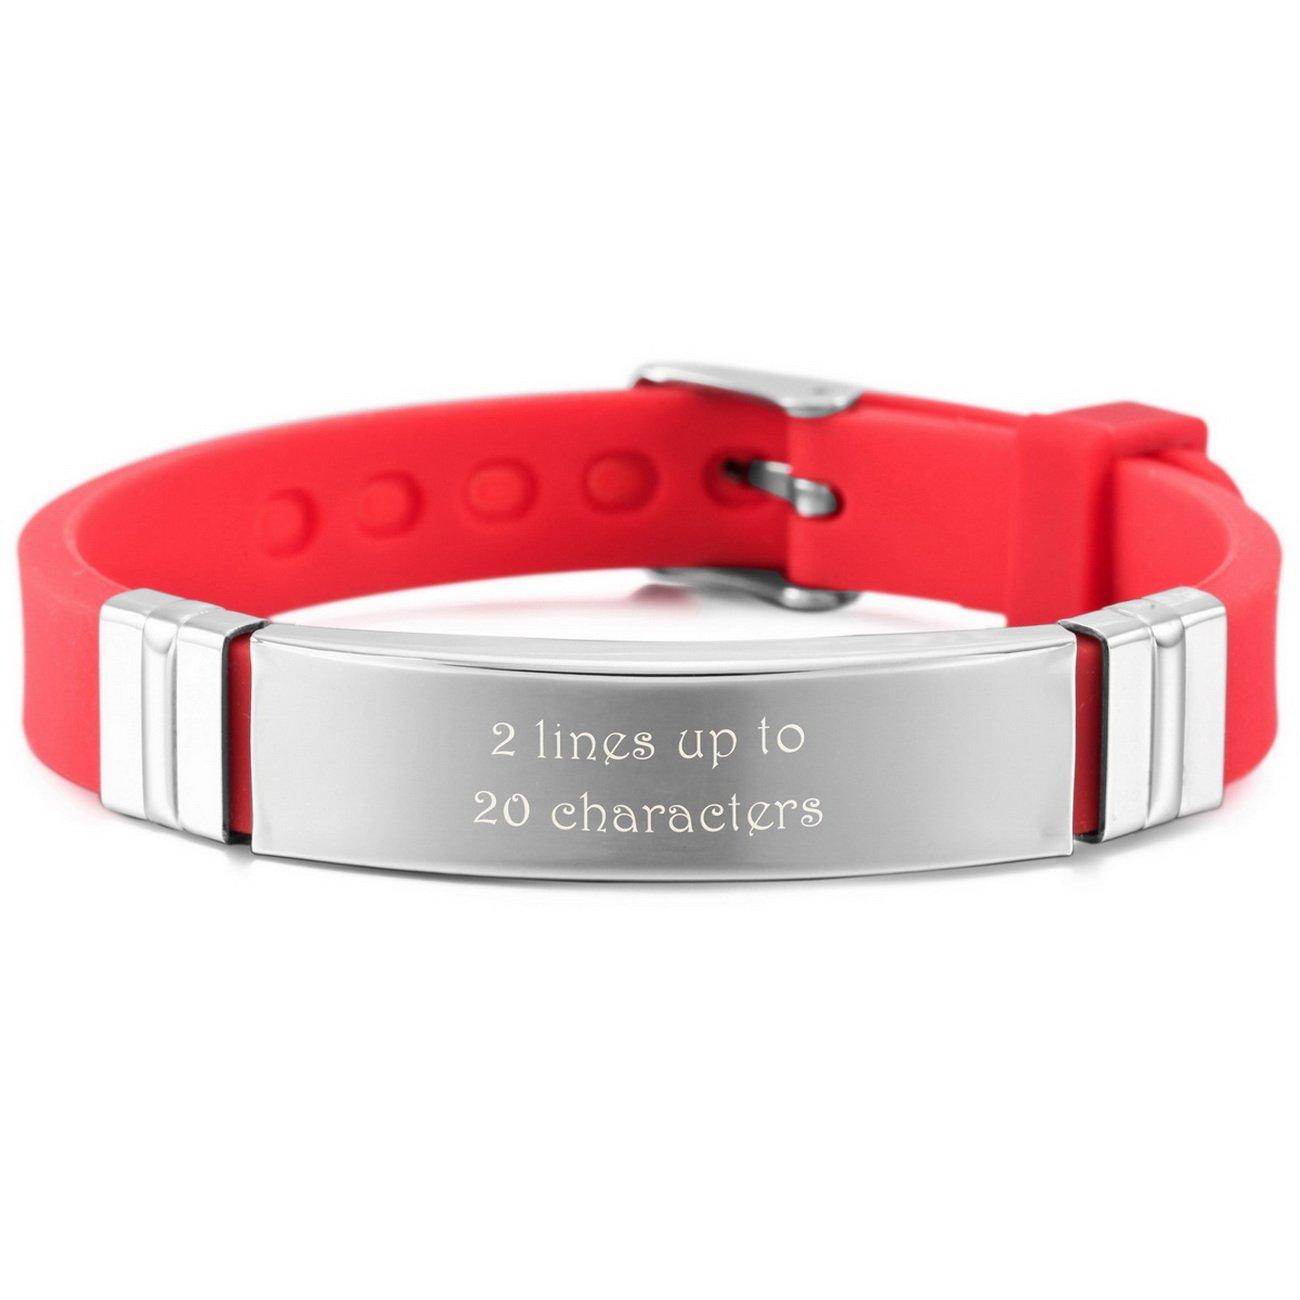 MeMeDIY Silver Tone Red Stainless Steel Rubber Bracelet Bangle Adjustable - Customized Engraving